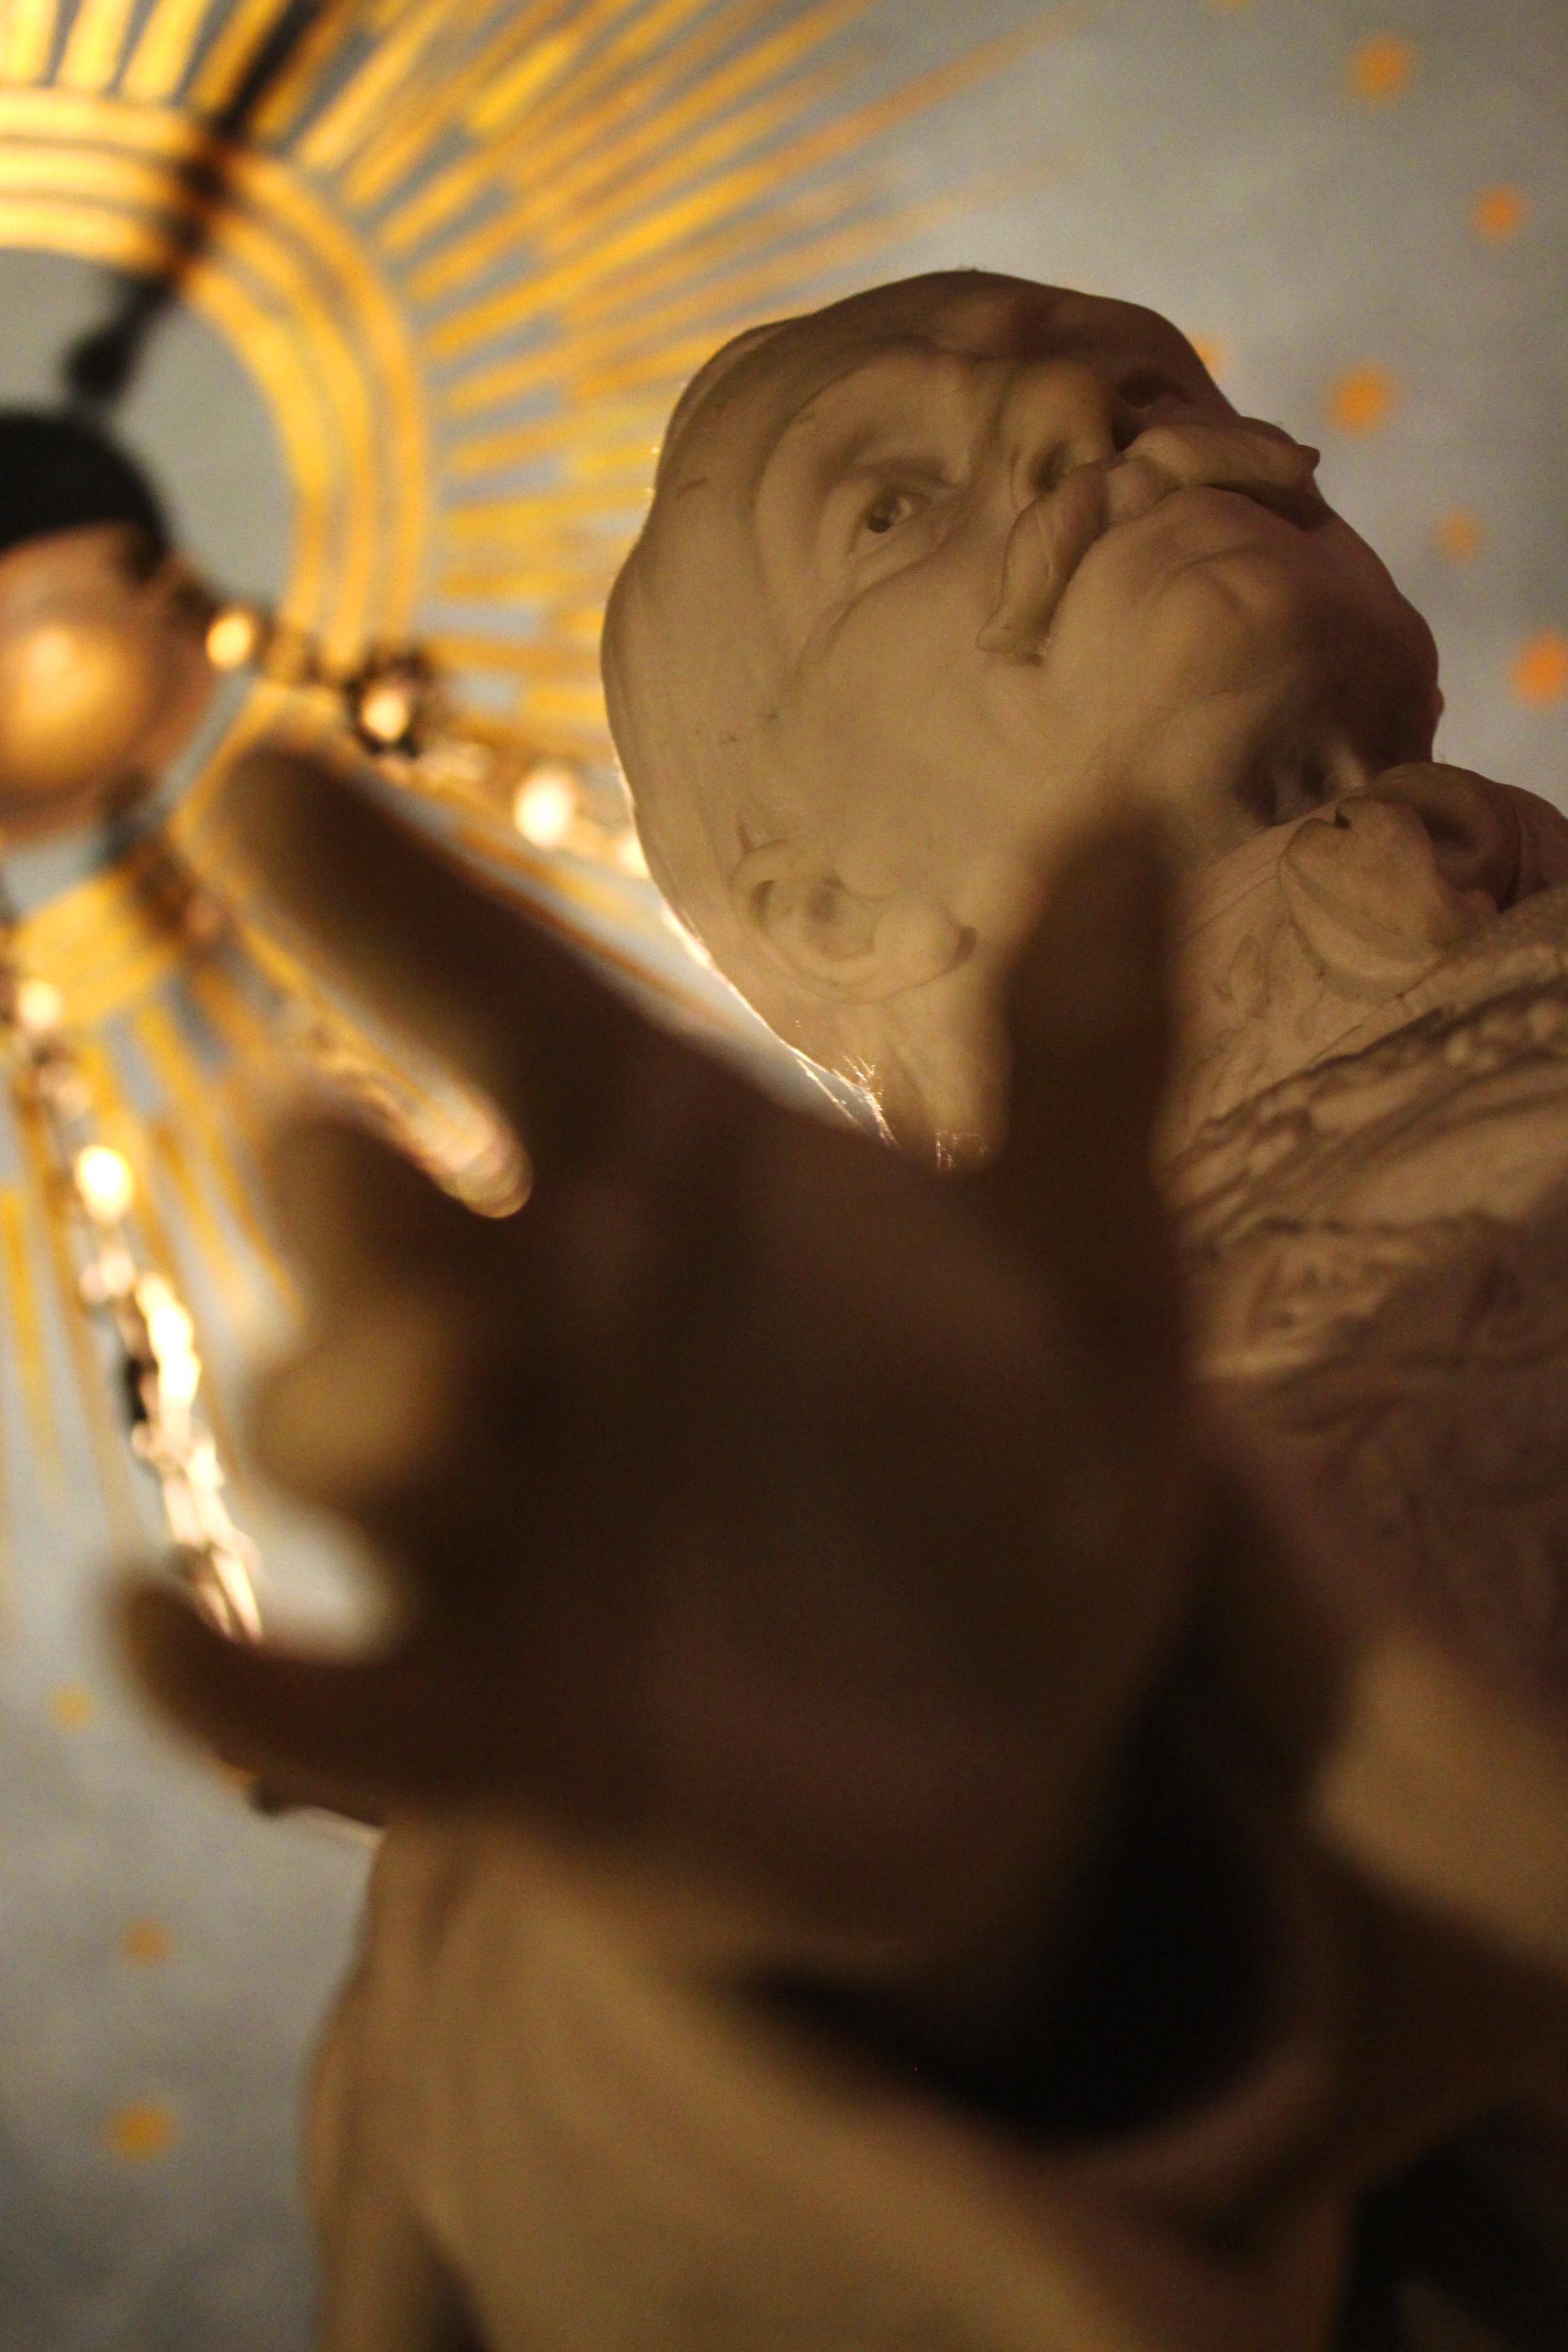 József nádor kripta